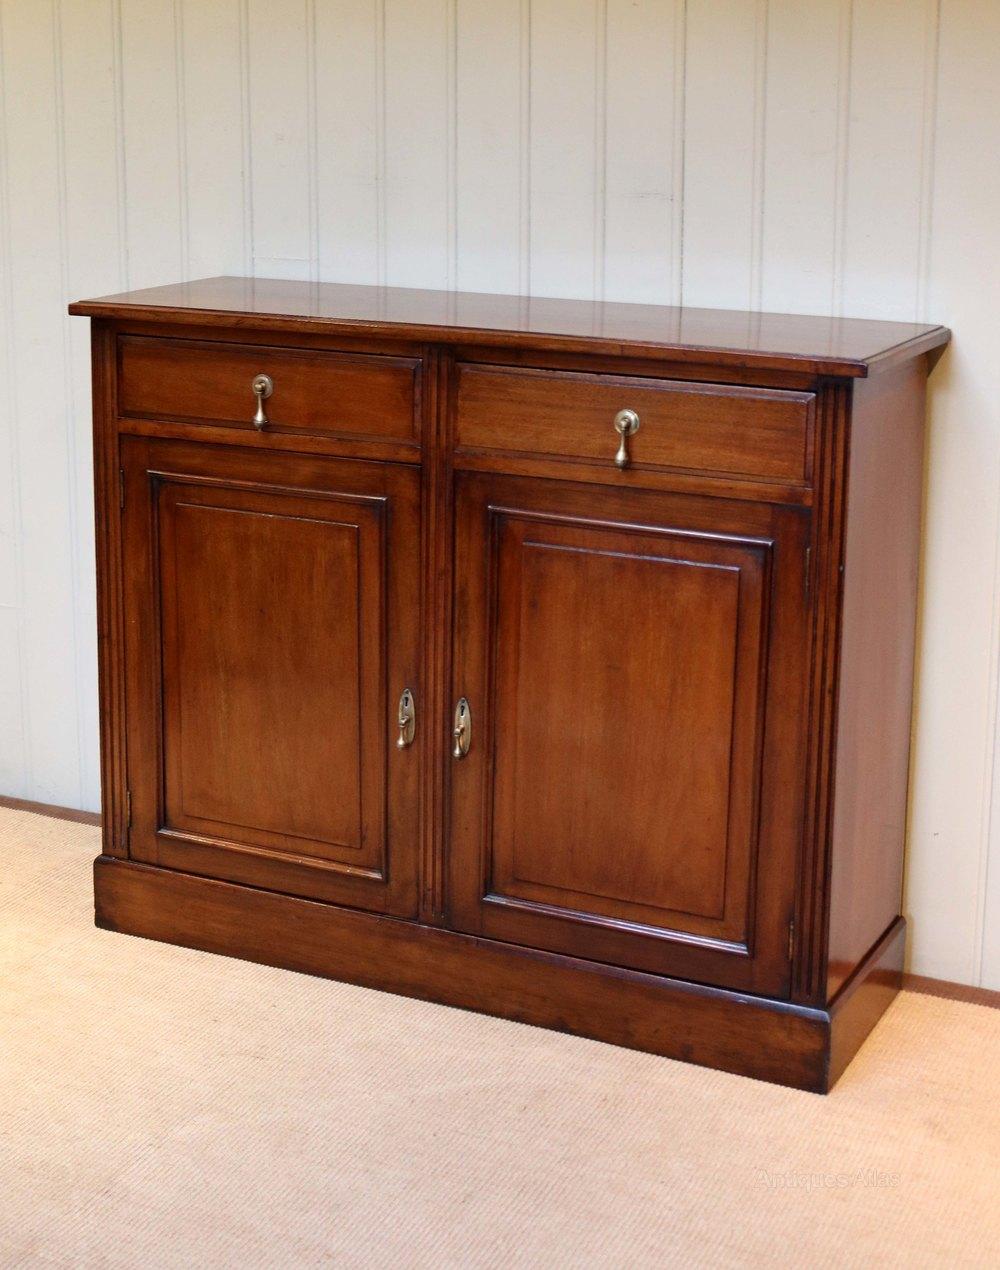 edwardian mahogany sideboard antiques atlas. Black Bedroom Furniture Sets. Home Design Ideas